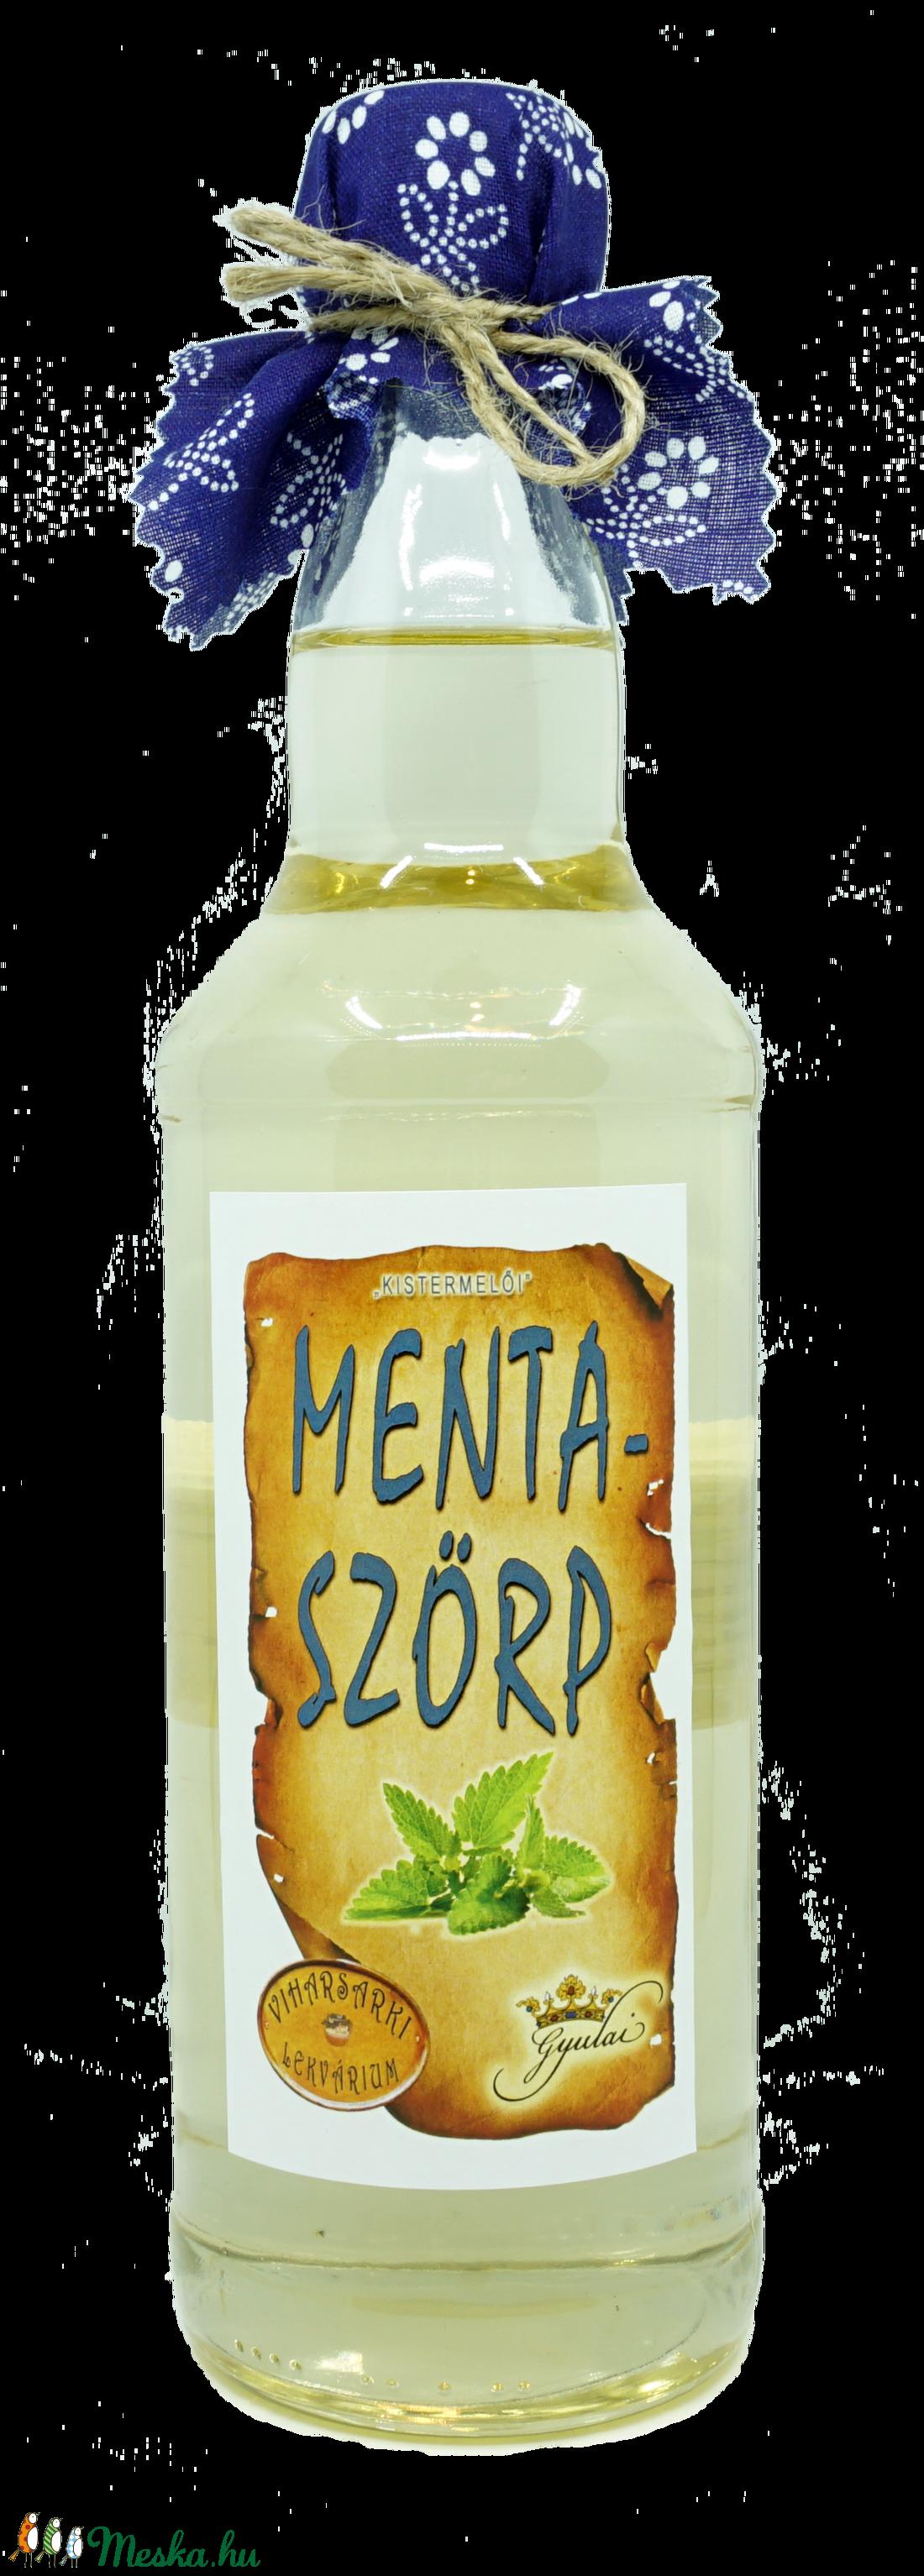 Menta szörp (500 ml) (viharsarkilekvariu) - Meska.hu